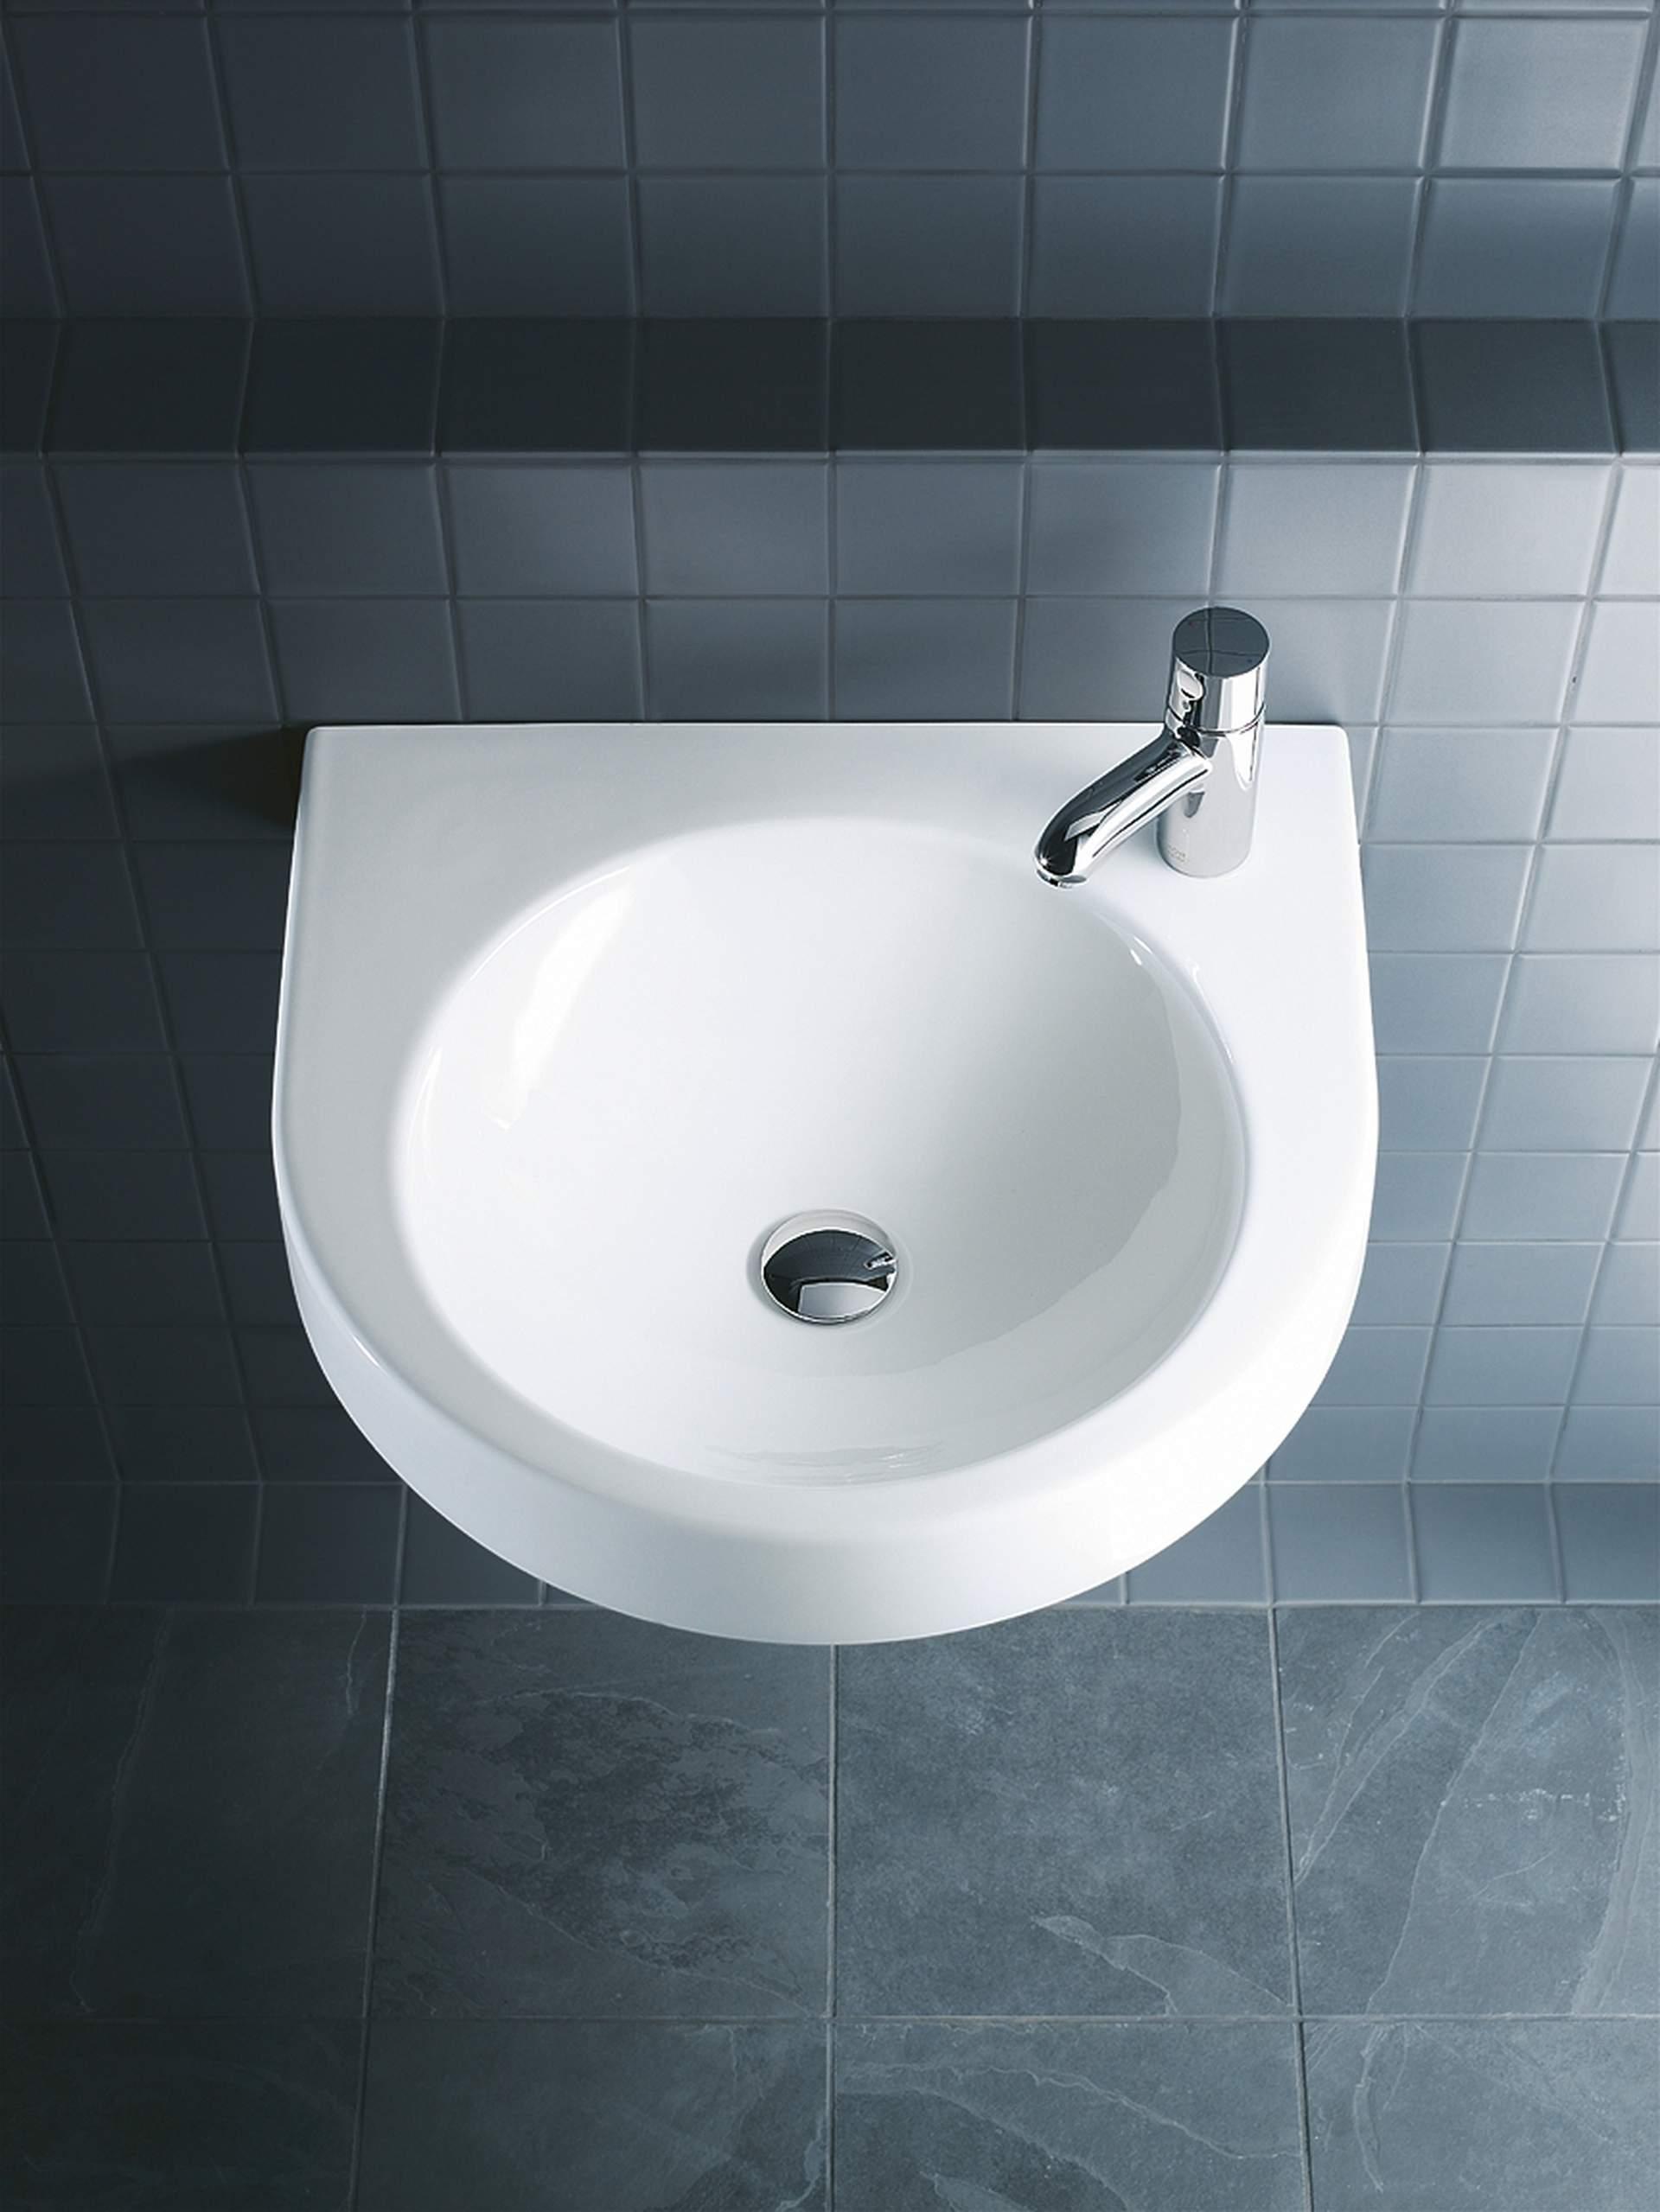 Duravit Architec Tubs Washbasins Bidets Amp More Duravit